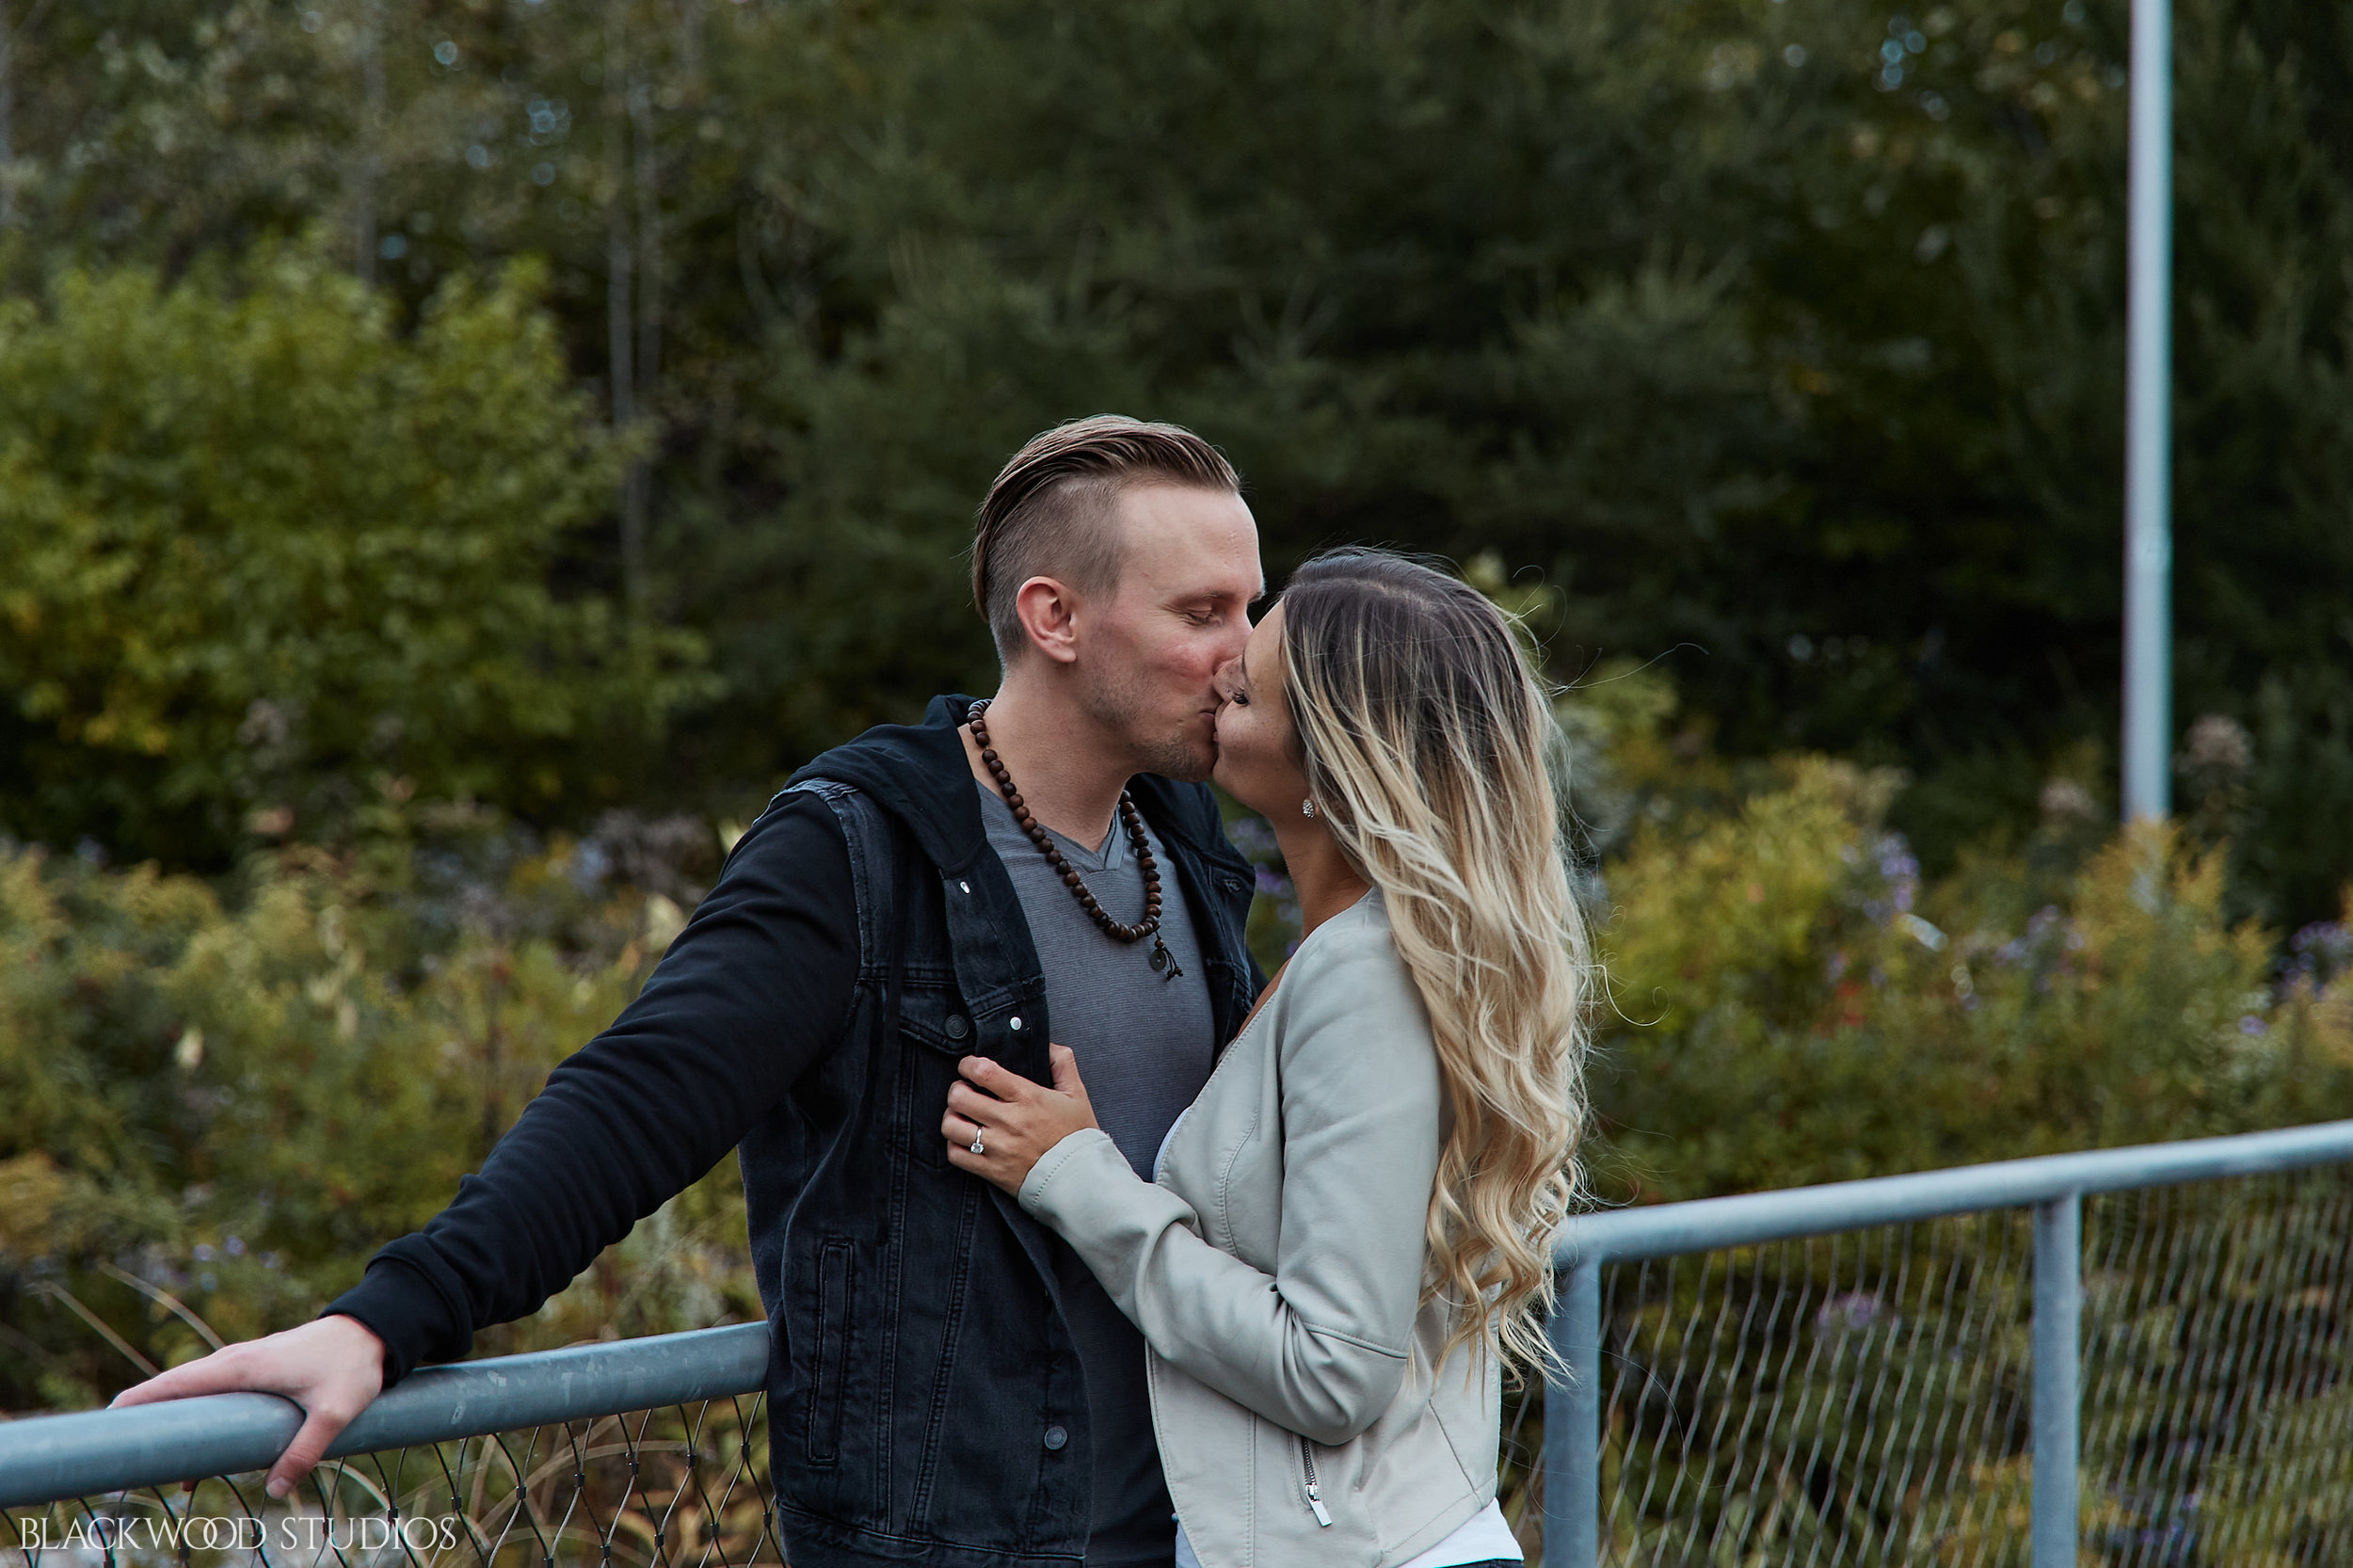 Blackwood-Studios-20181012-182445-Aleisha-and-Brad-Engagement-photography-Toronto-Ontario-Canada-Corktown-Common.jpg